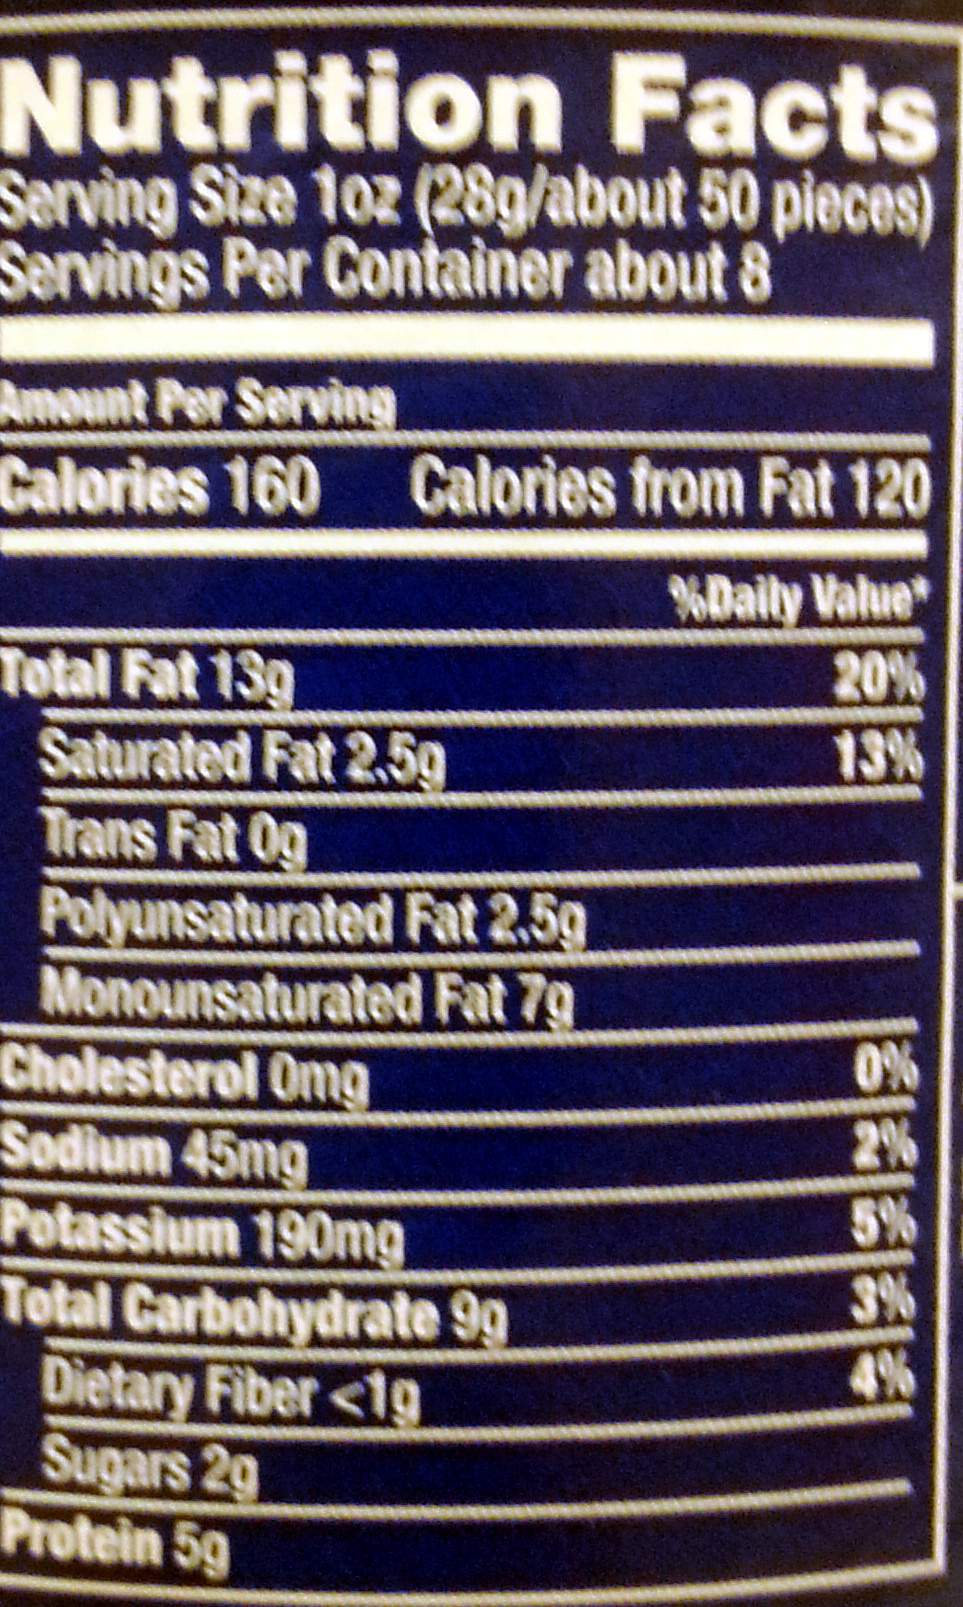 Planters, lightly salted cashews halves & pieces, lightly salted, lightly salted - Informations nutritionnelles - en